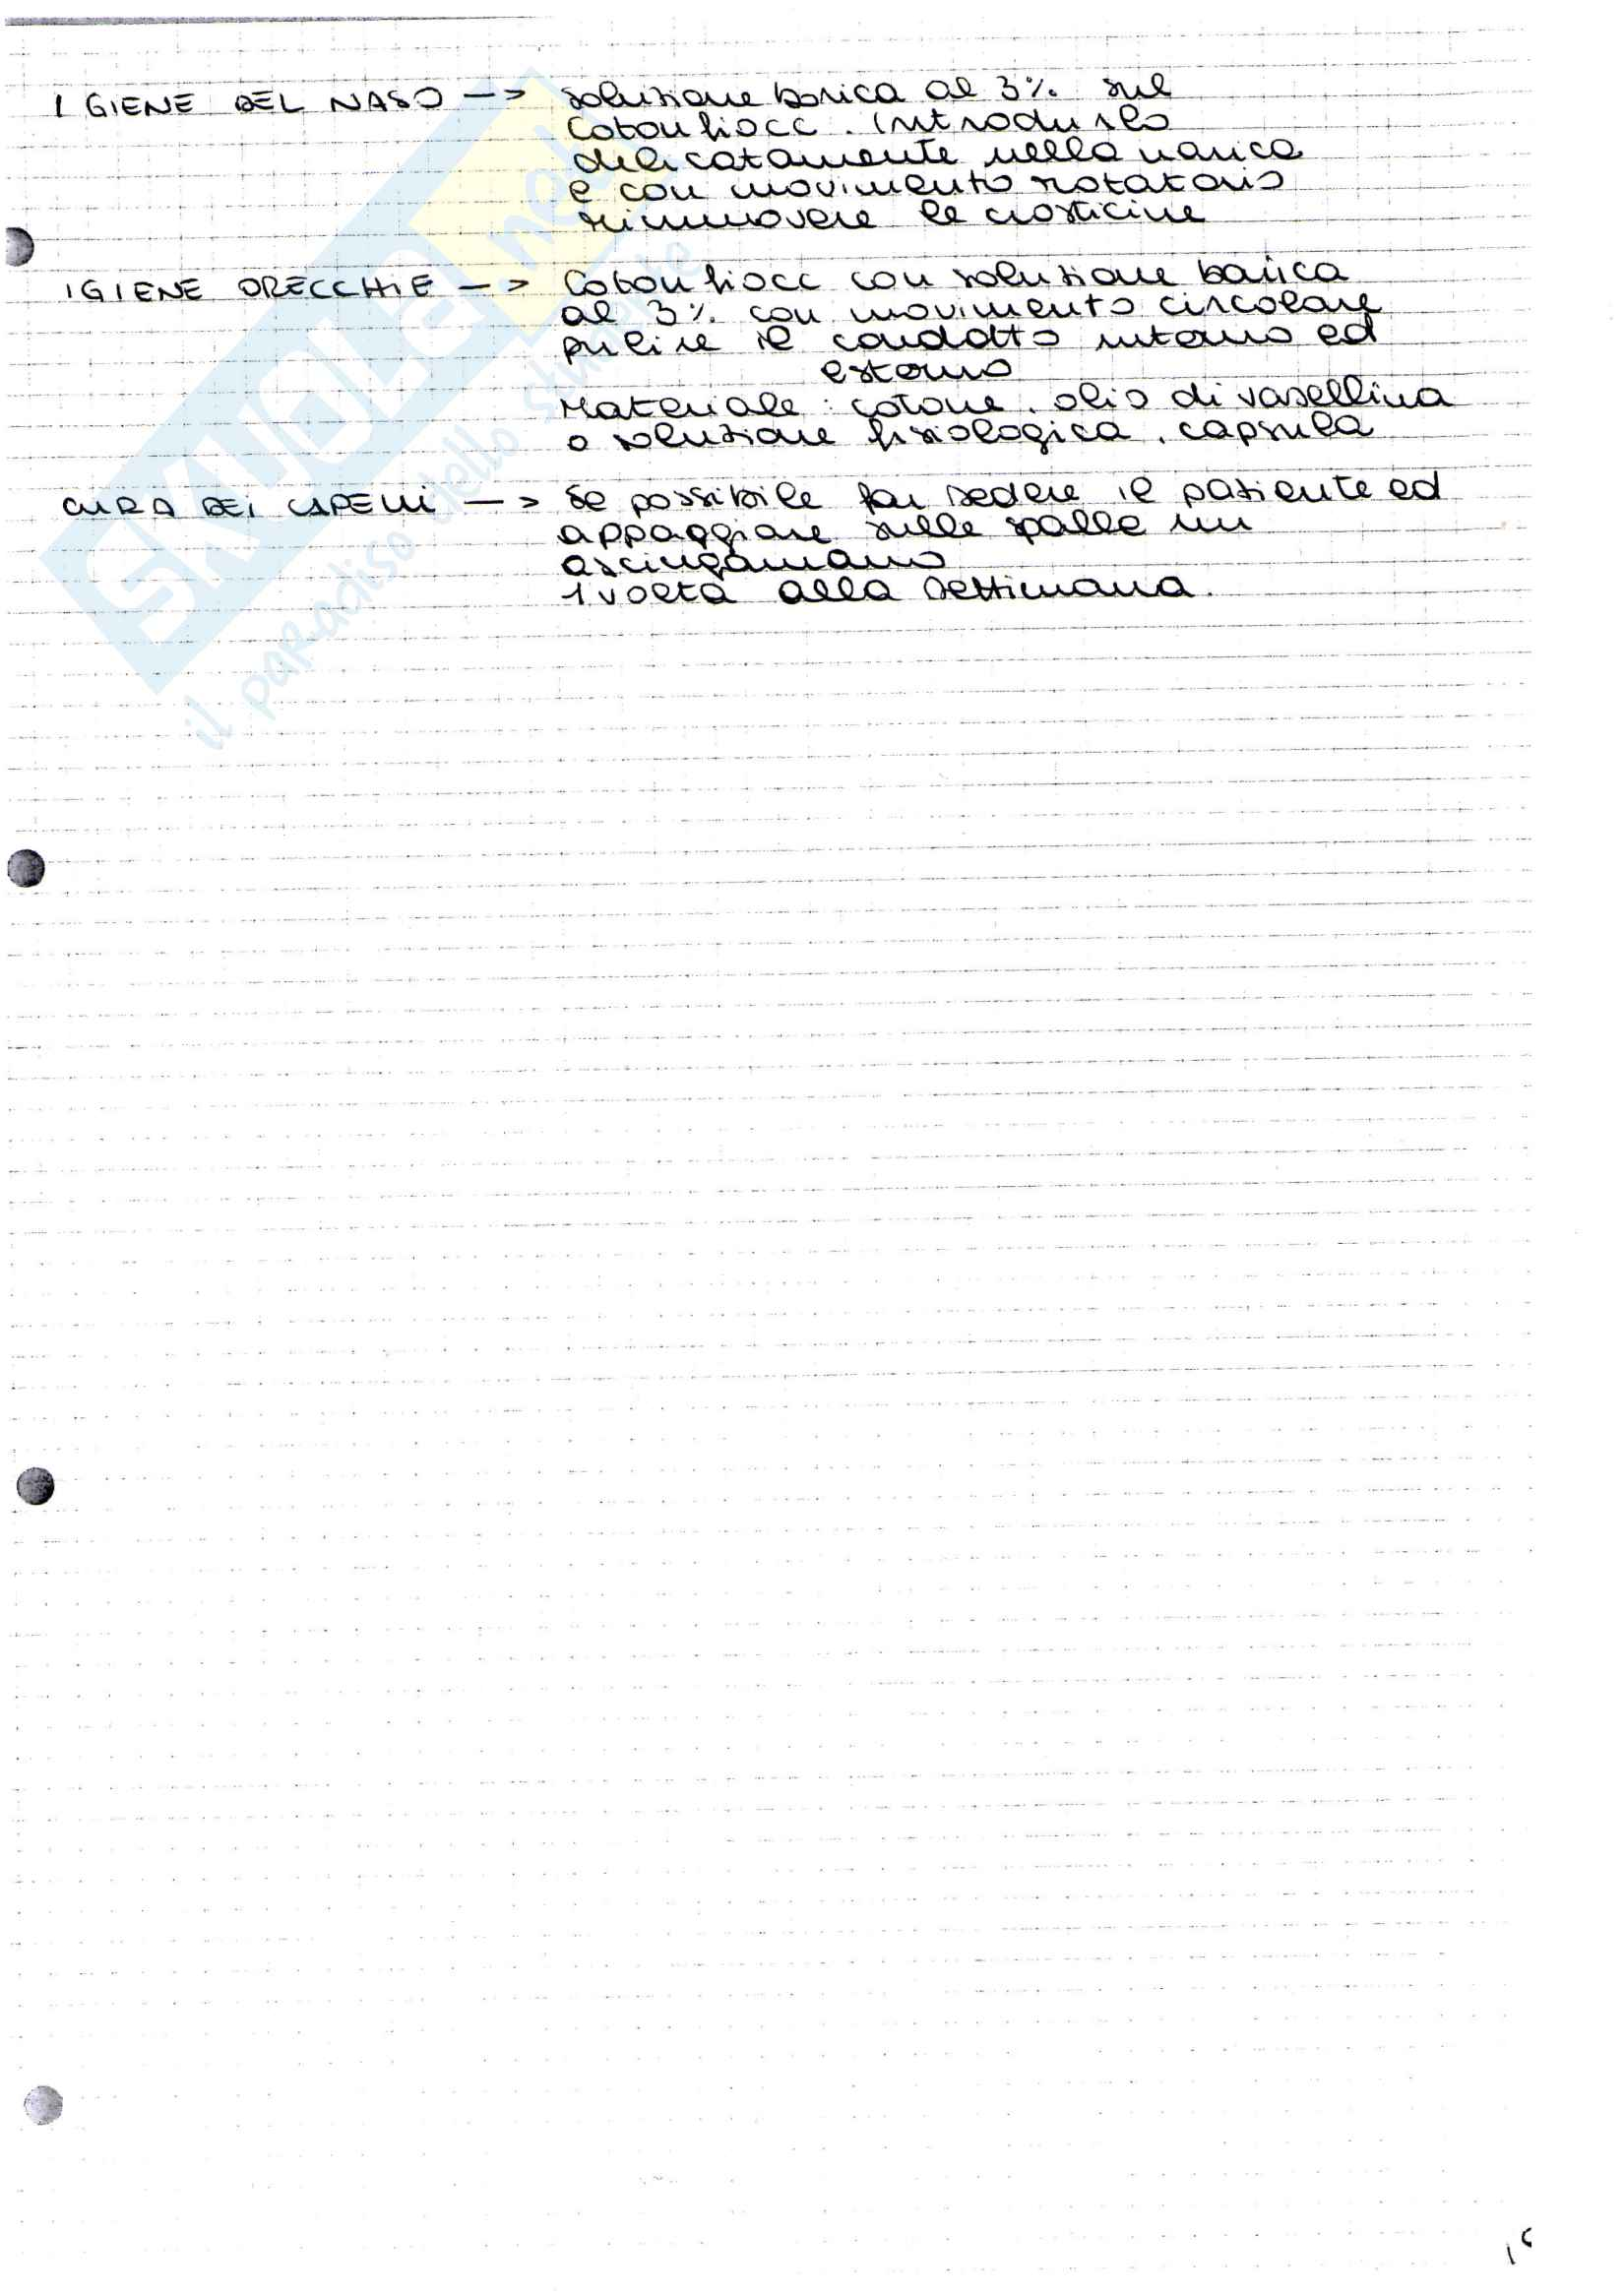 Infermieristica I - Infermieristica clinica Pag. 31